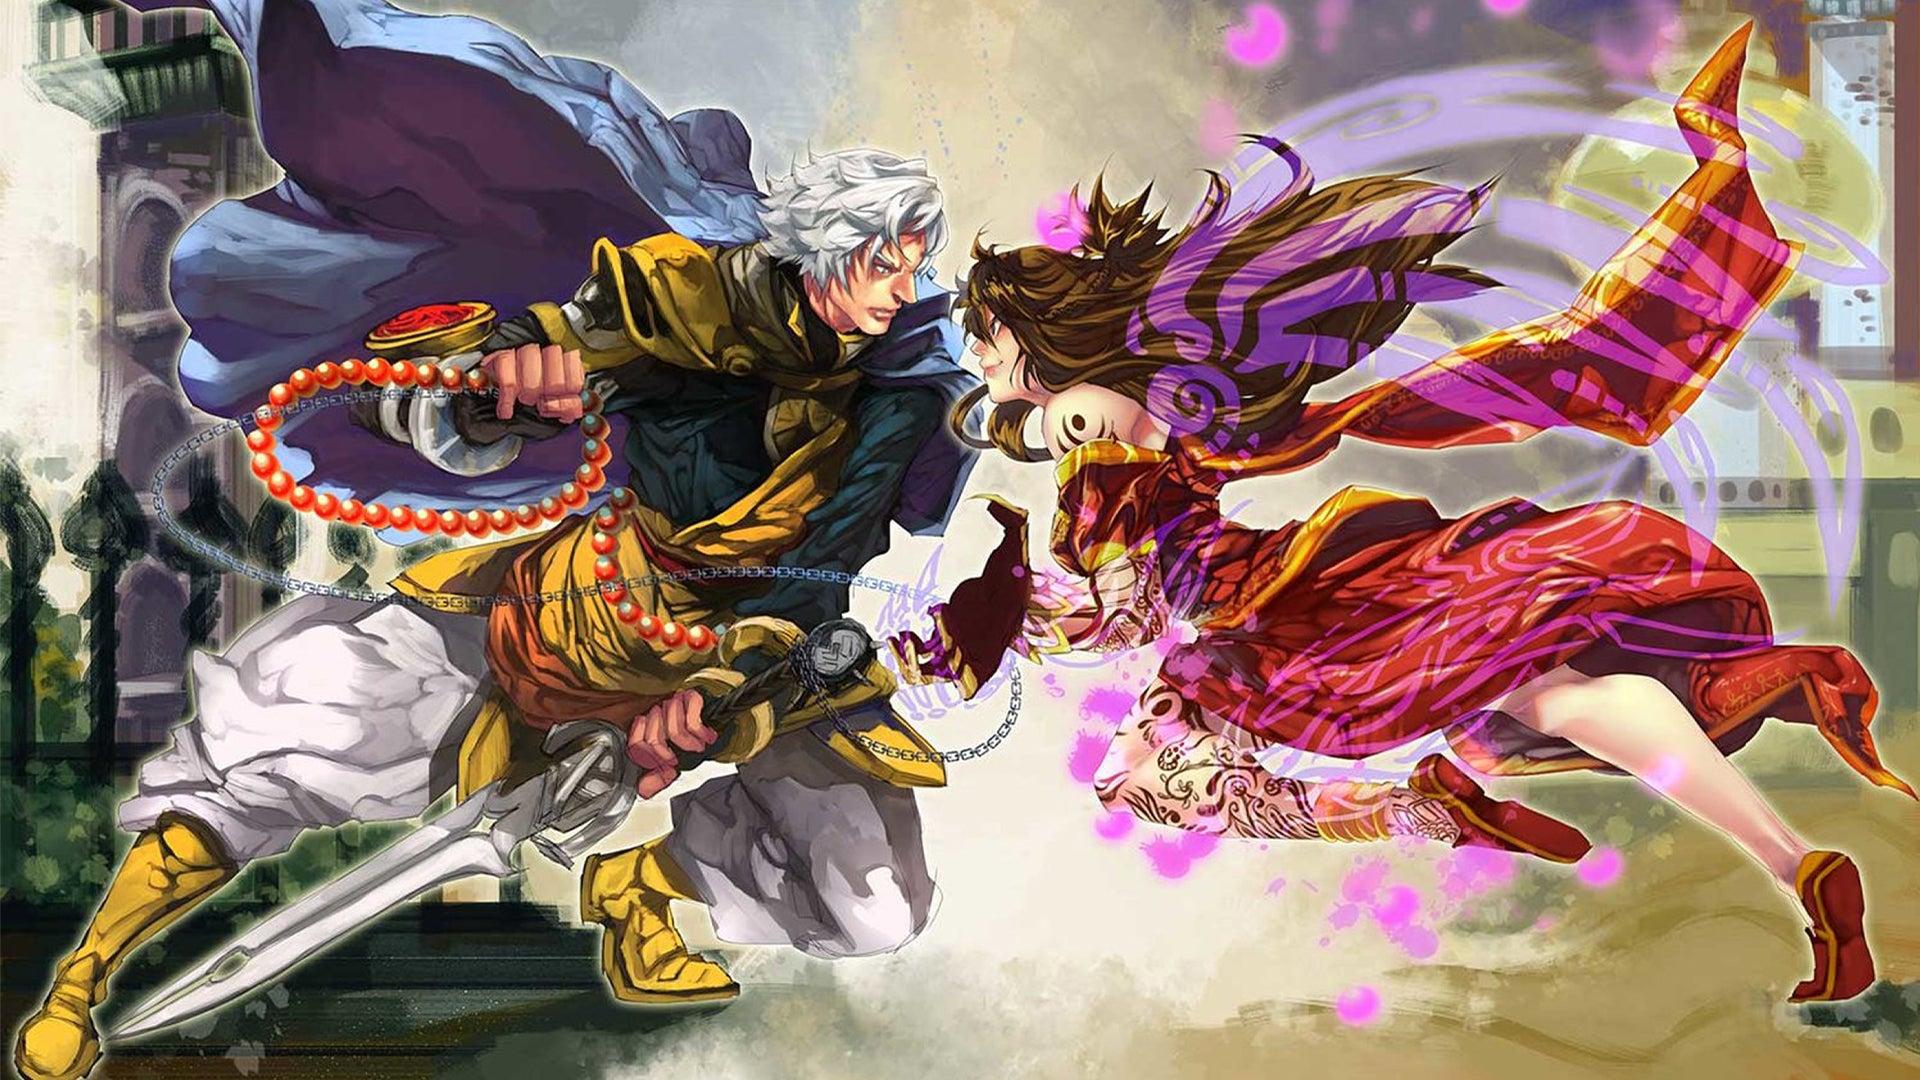 battlecon-card-game-artwork.jpg